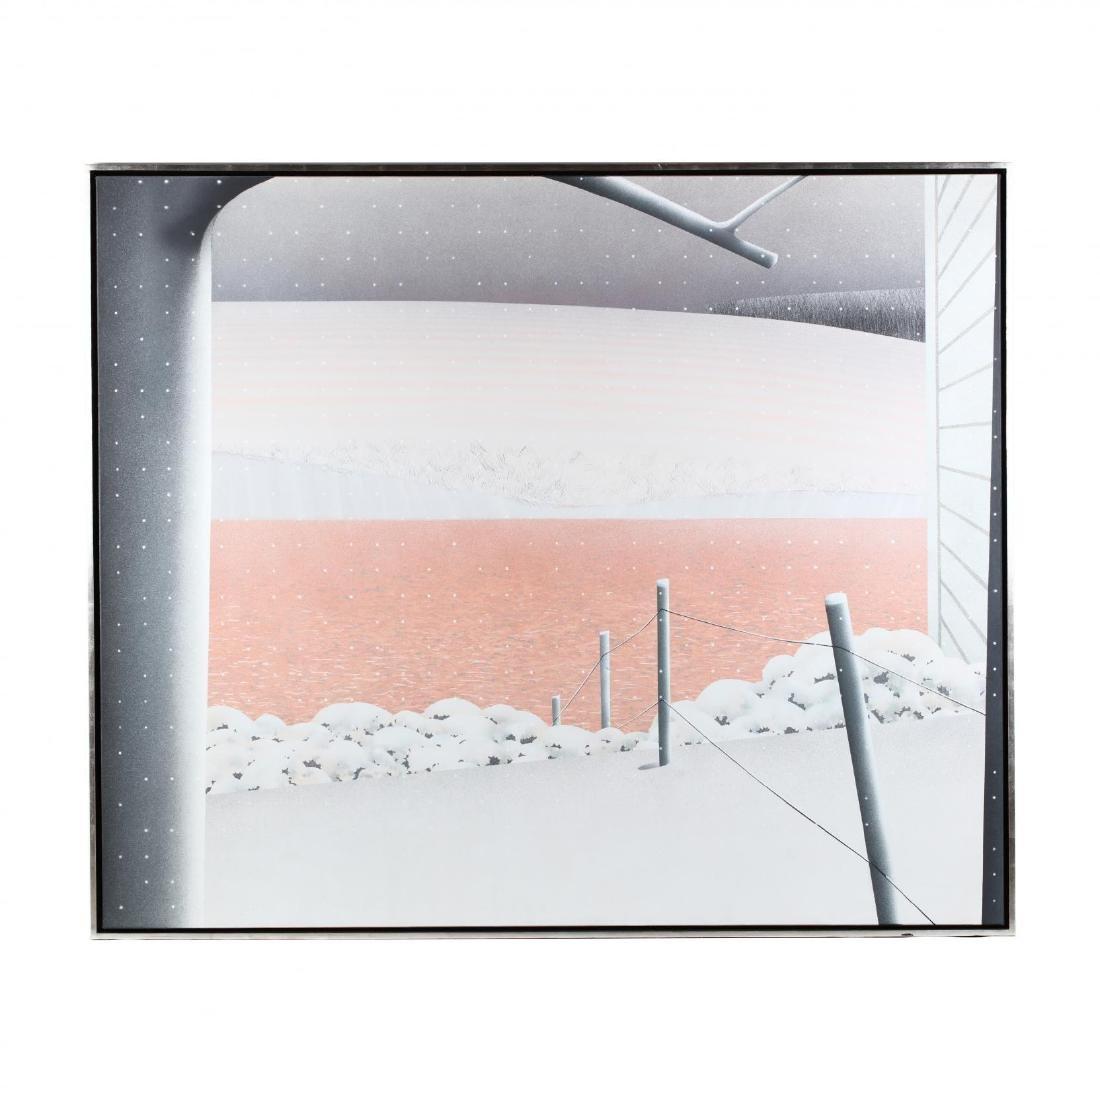 Maud Gatewood (NC, 1934-2004),  Farm Pond - Snow Ending